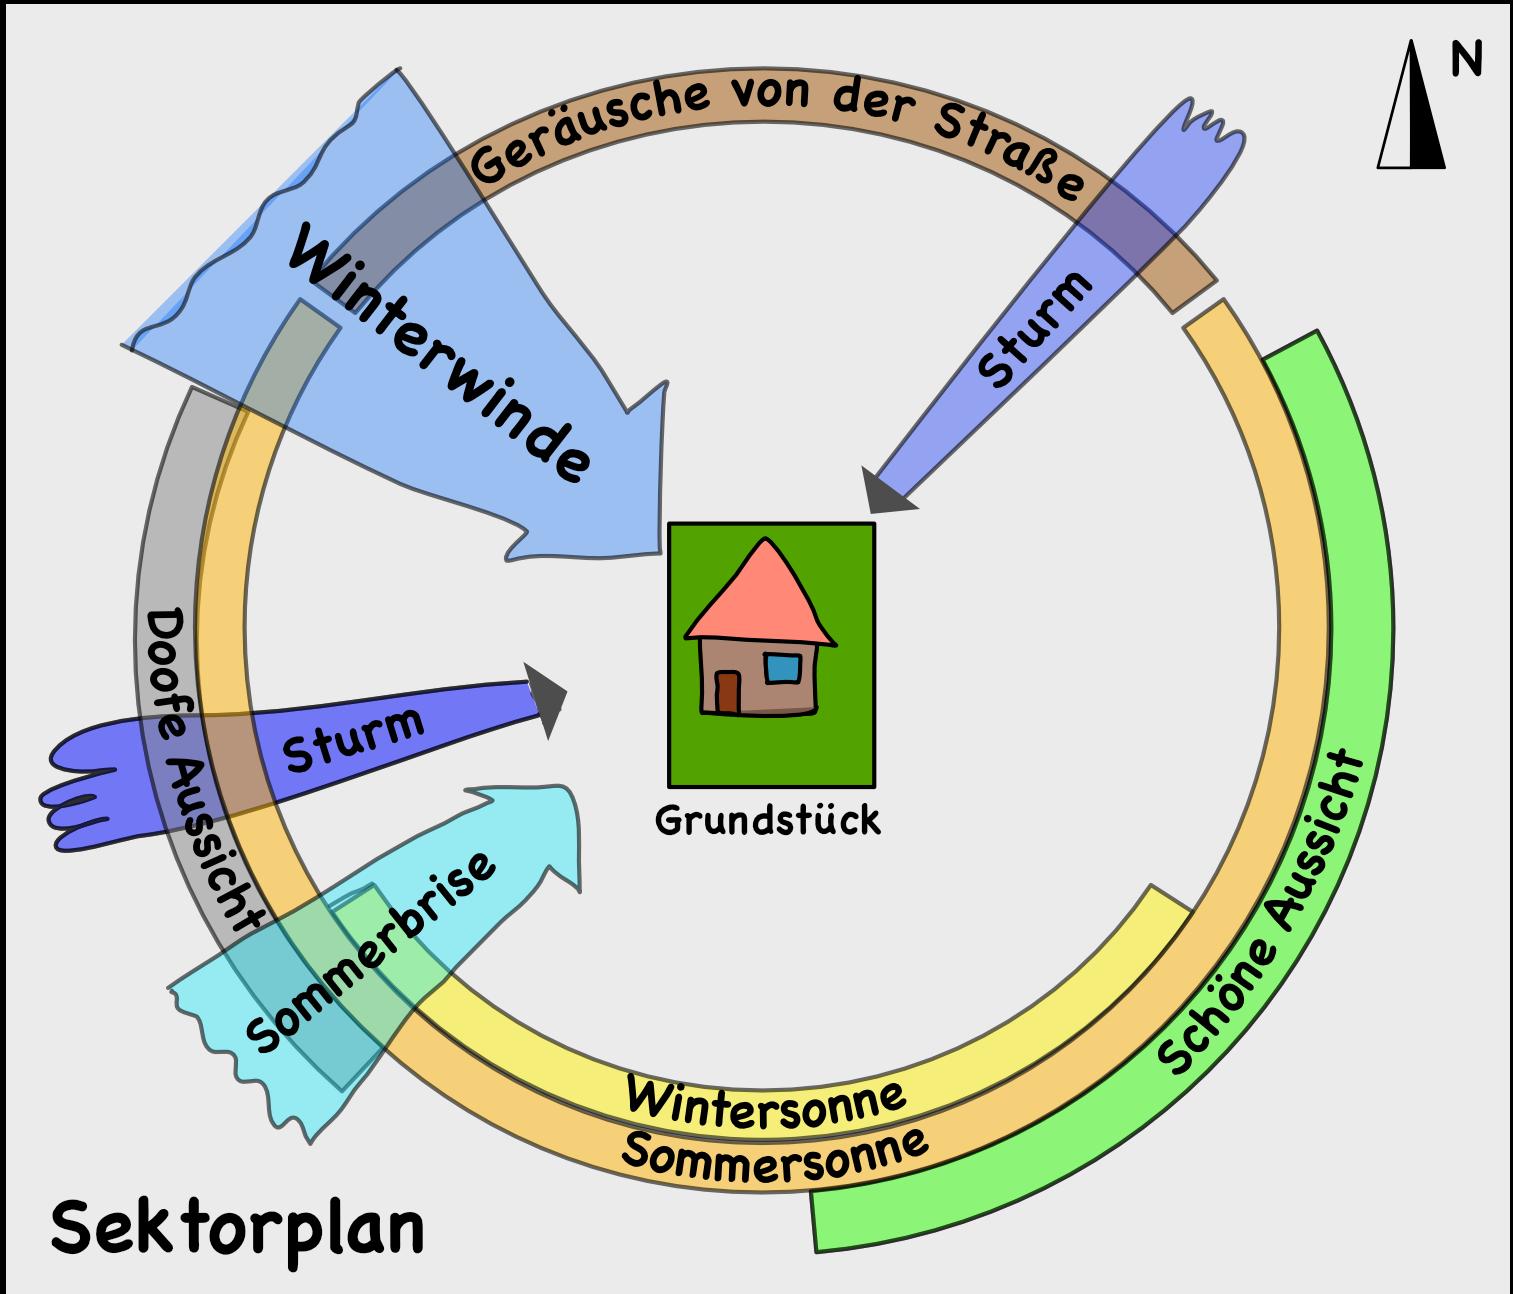 sektorplan